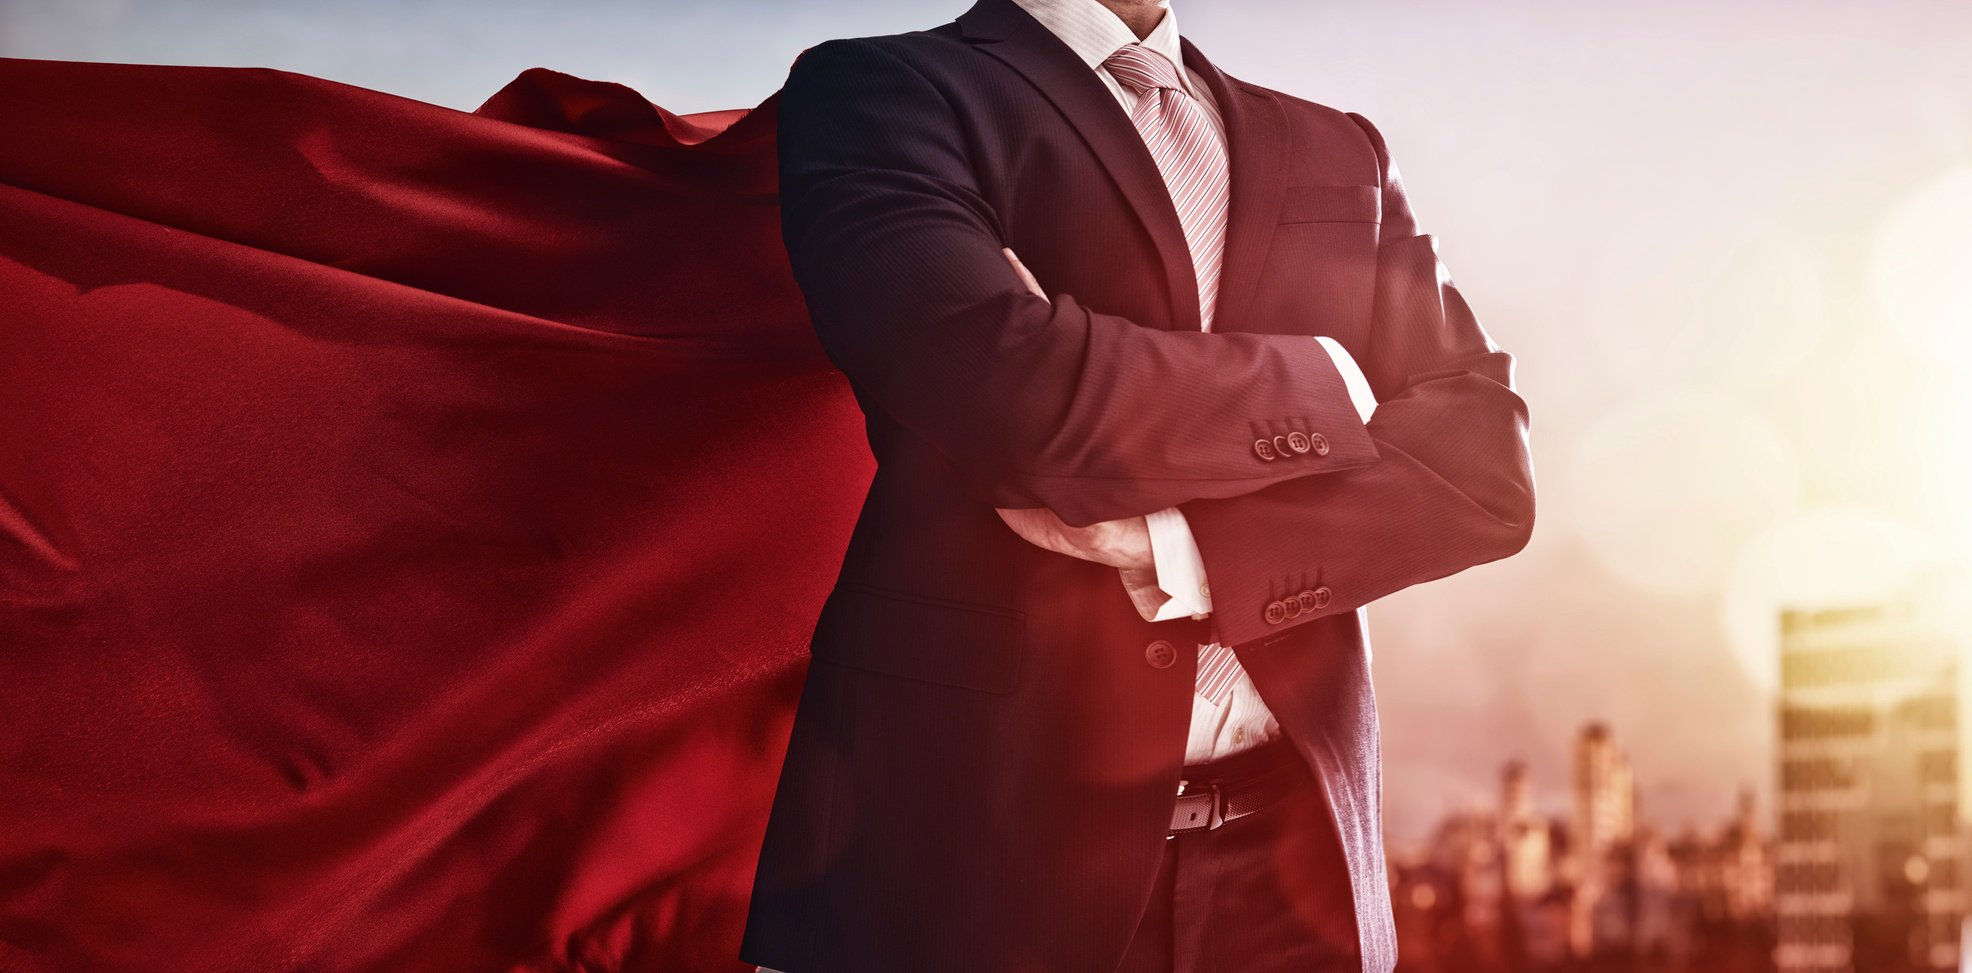 Business man in superhero cape